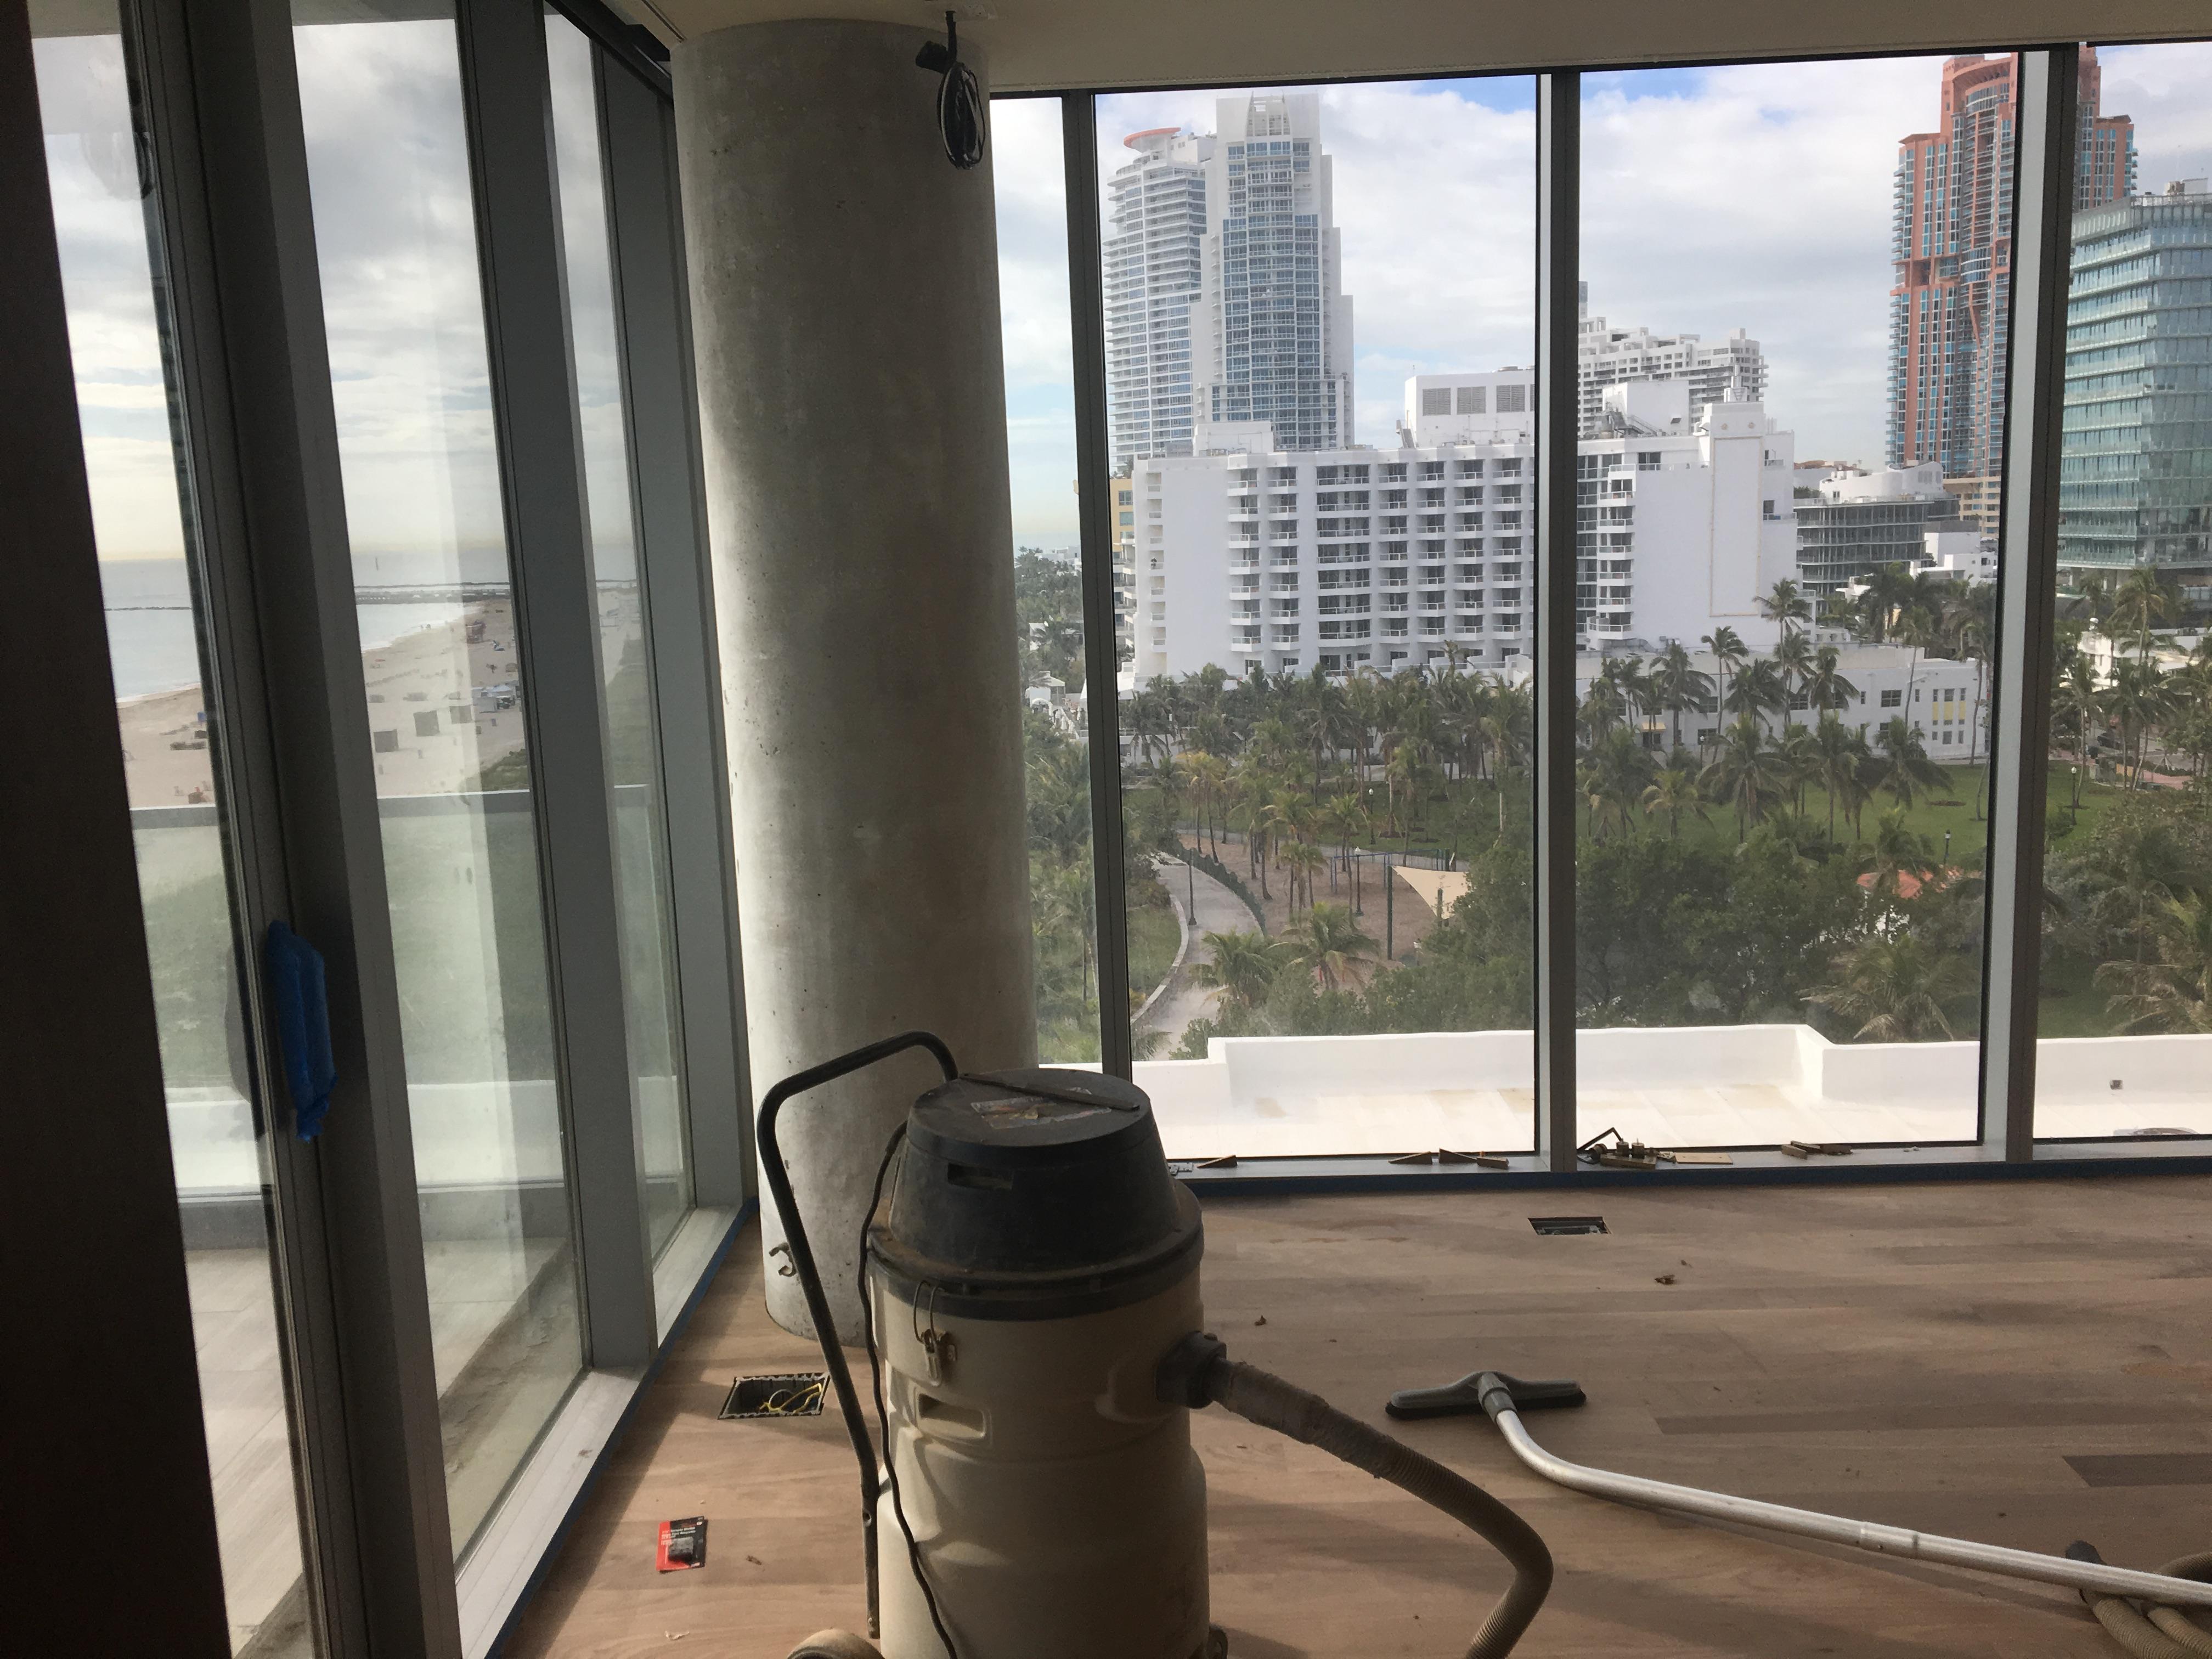 EE&G Restoration Orlando Water Damage, Fire Damage, Mold Remediation & Removal image 22